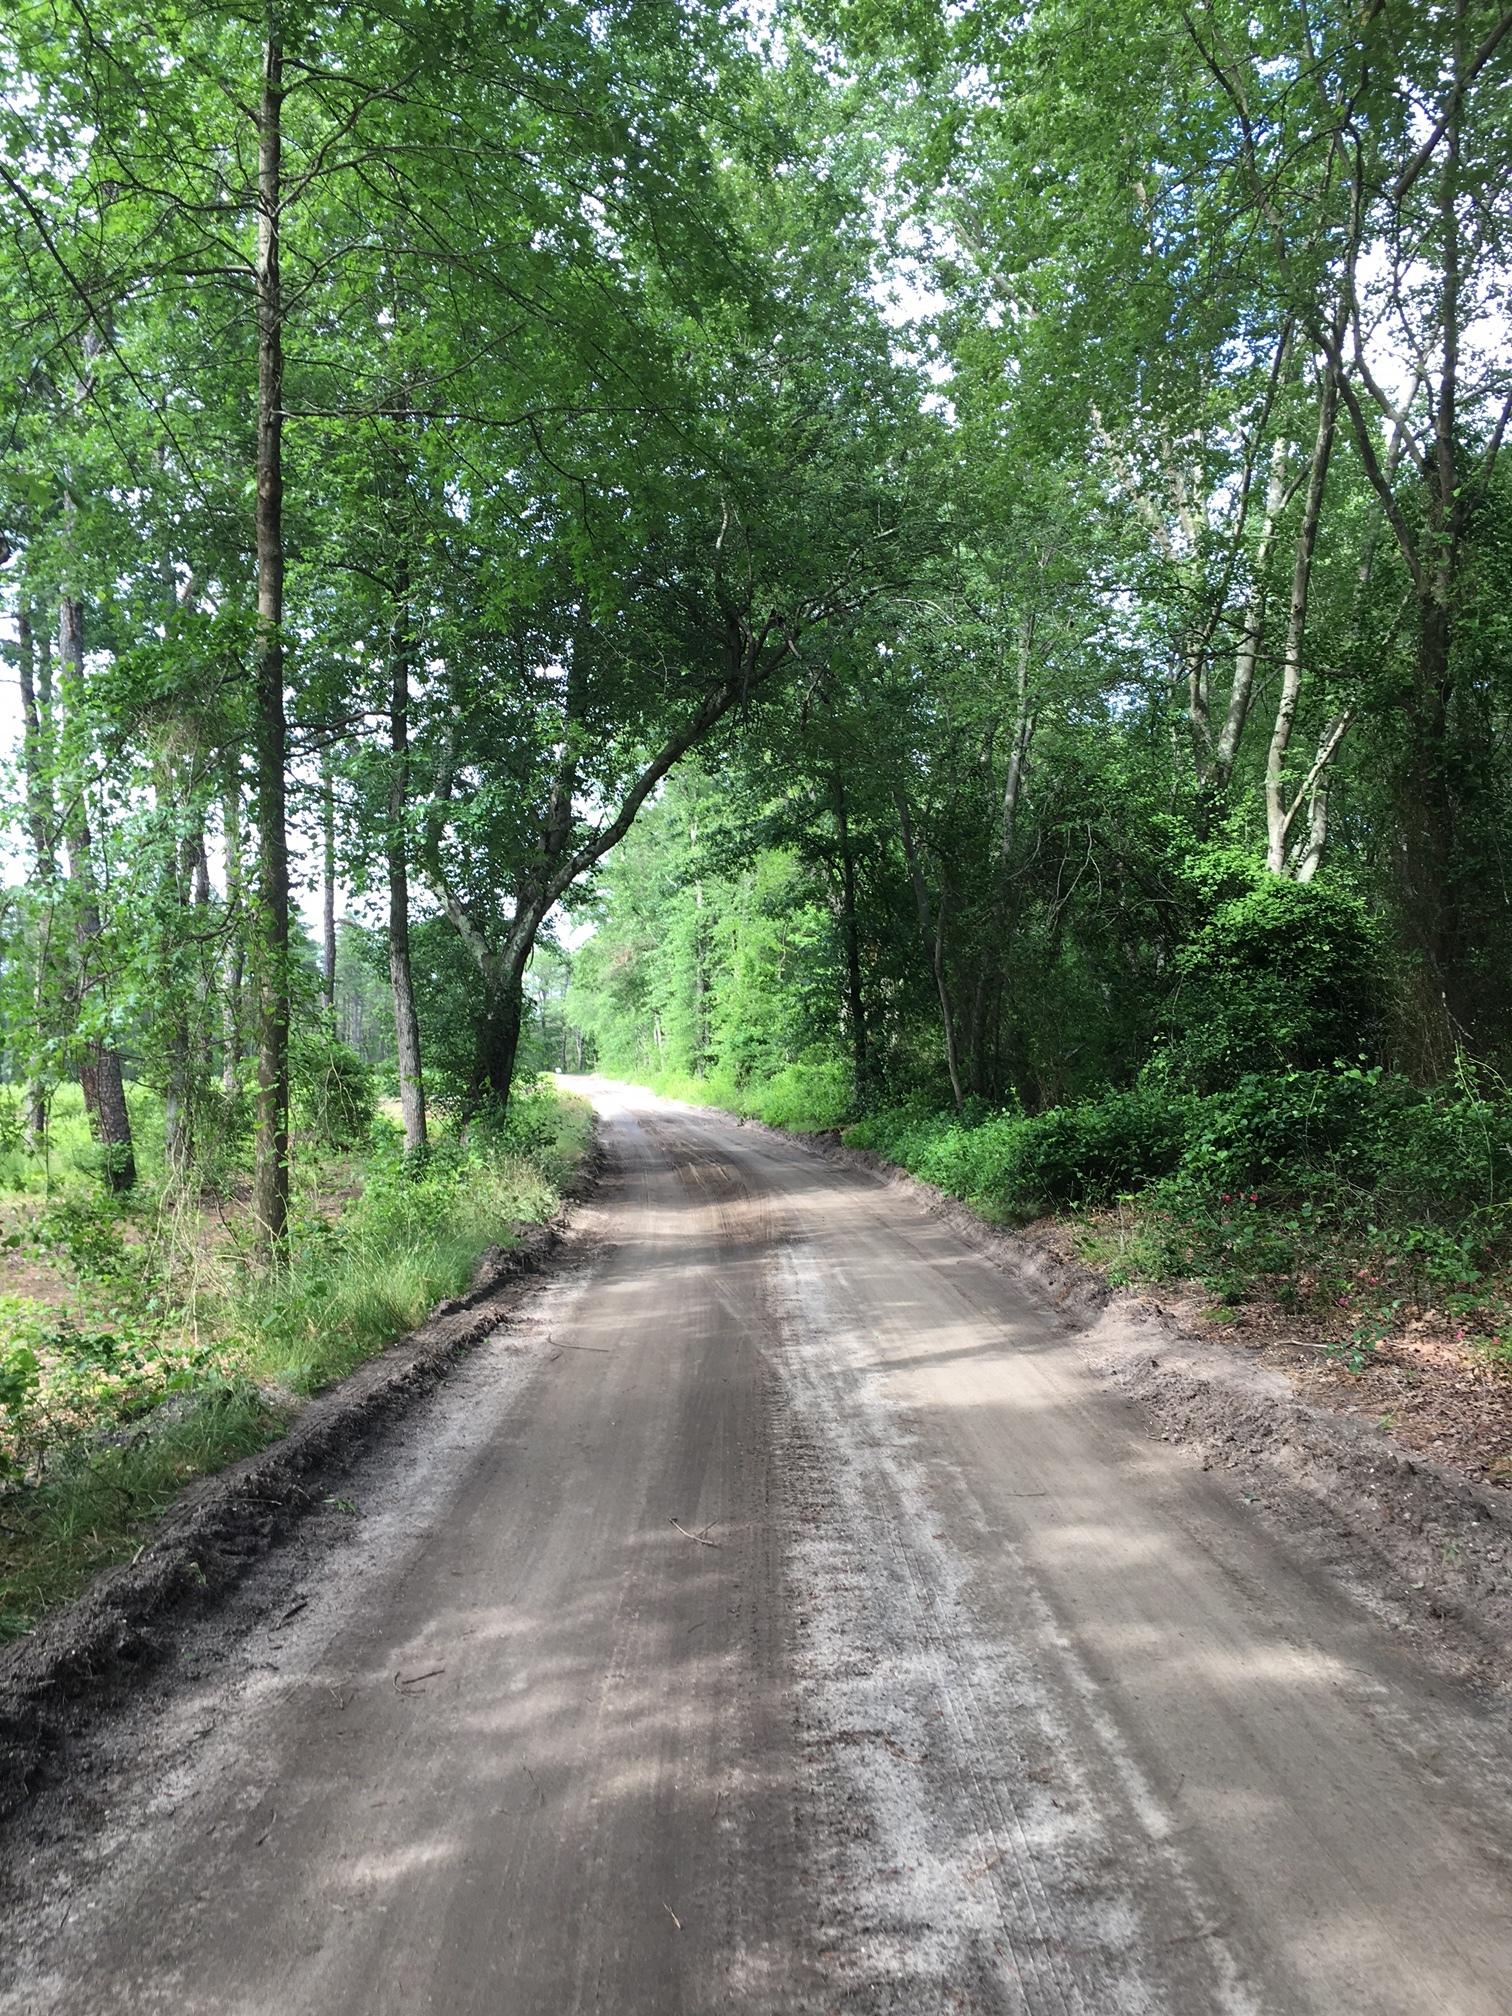 The long road in Whitesbog.